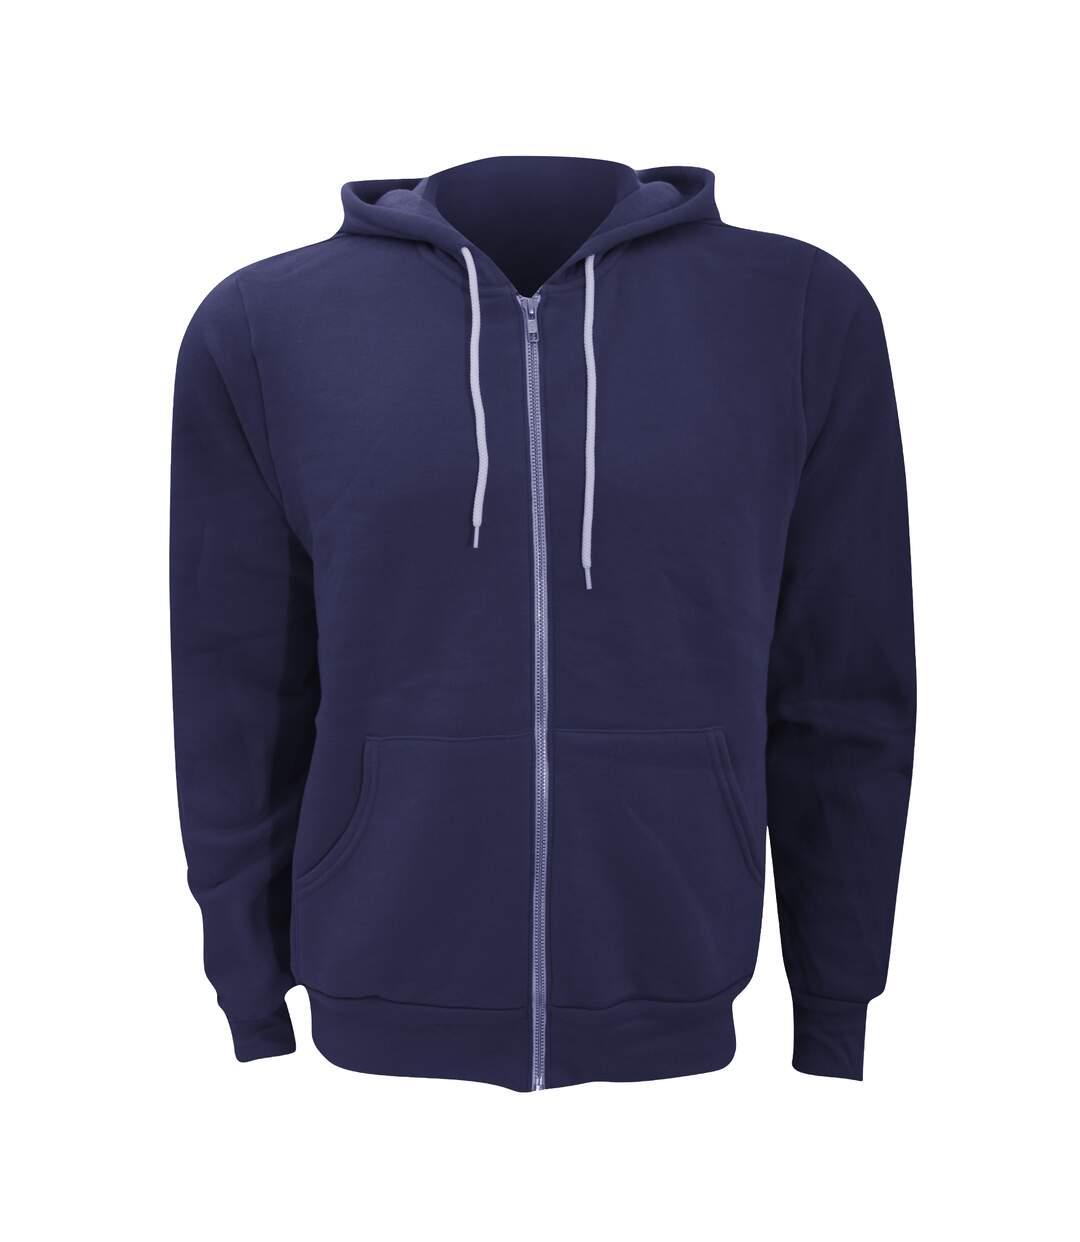 Canvas Unixex Zip-up Polycotton Fleece Hooded Sweatshirt / Hoodie (Navy Blue) - UTBC1337